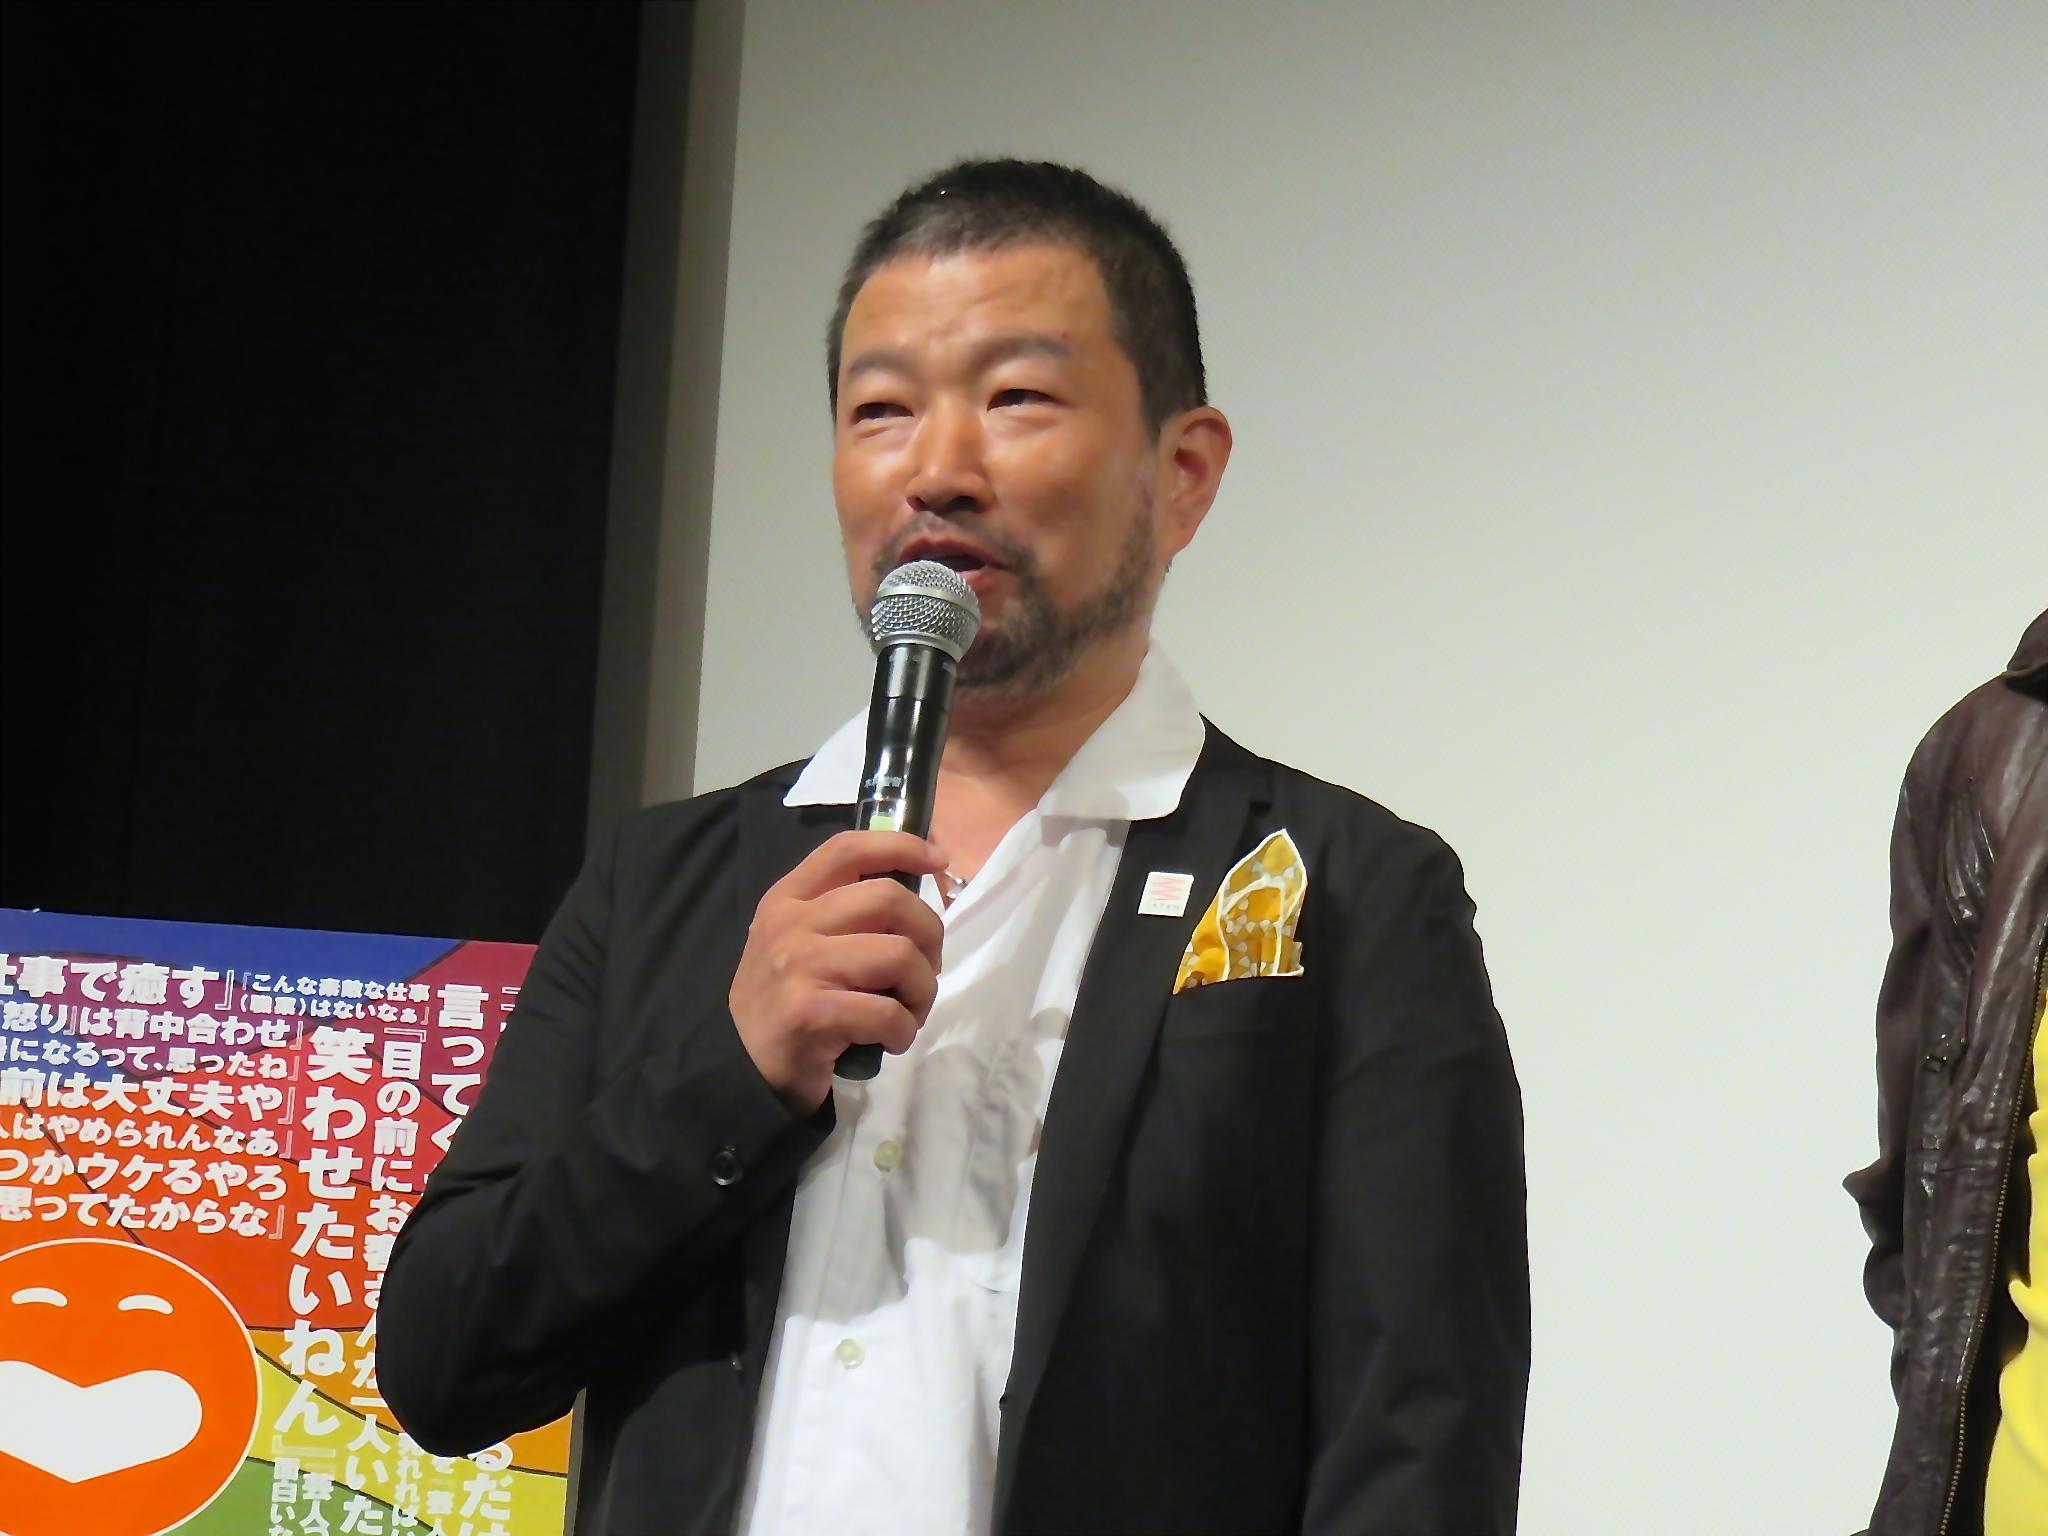 http://news.yoshimoto.co.jp/20171010201133-d1f41da346e6002d366a6334f028309644728f83.jpg